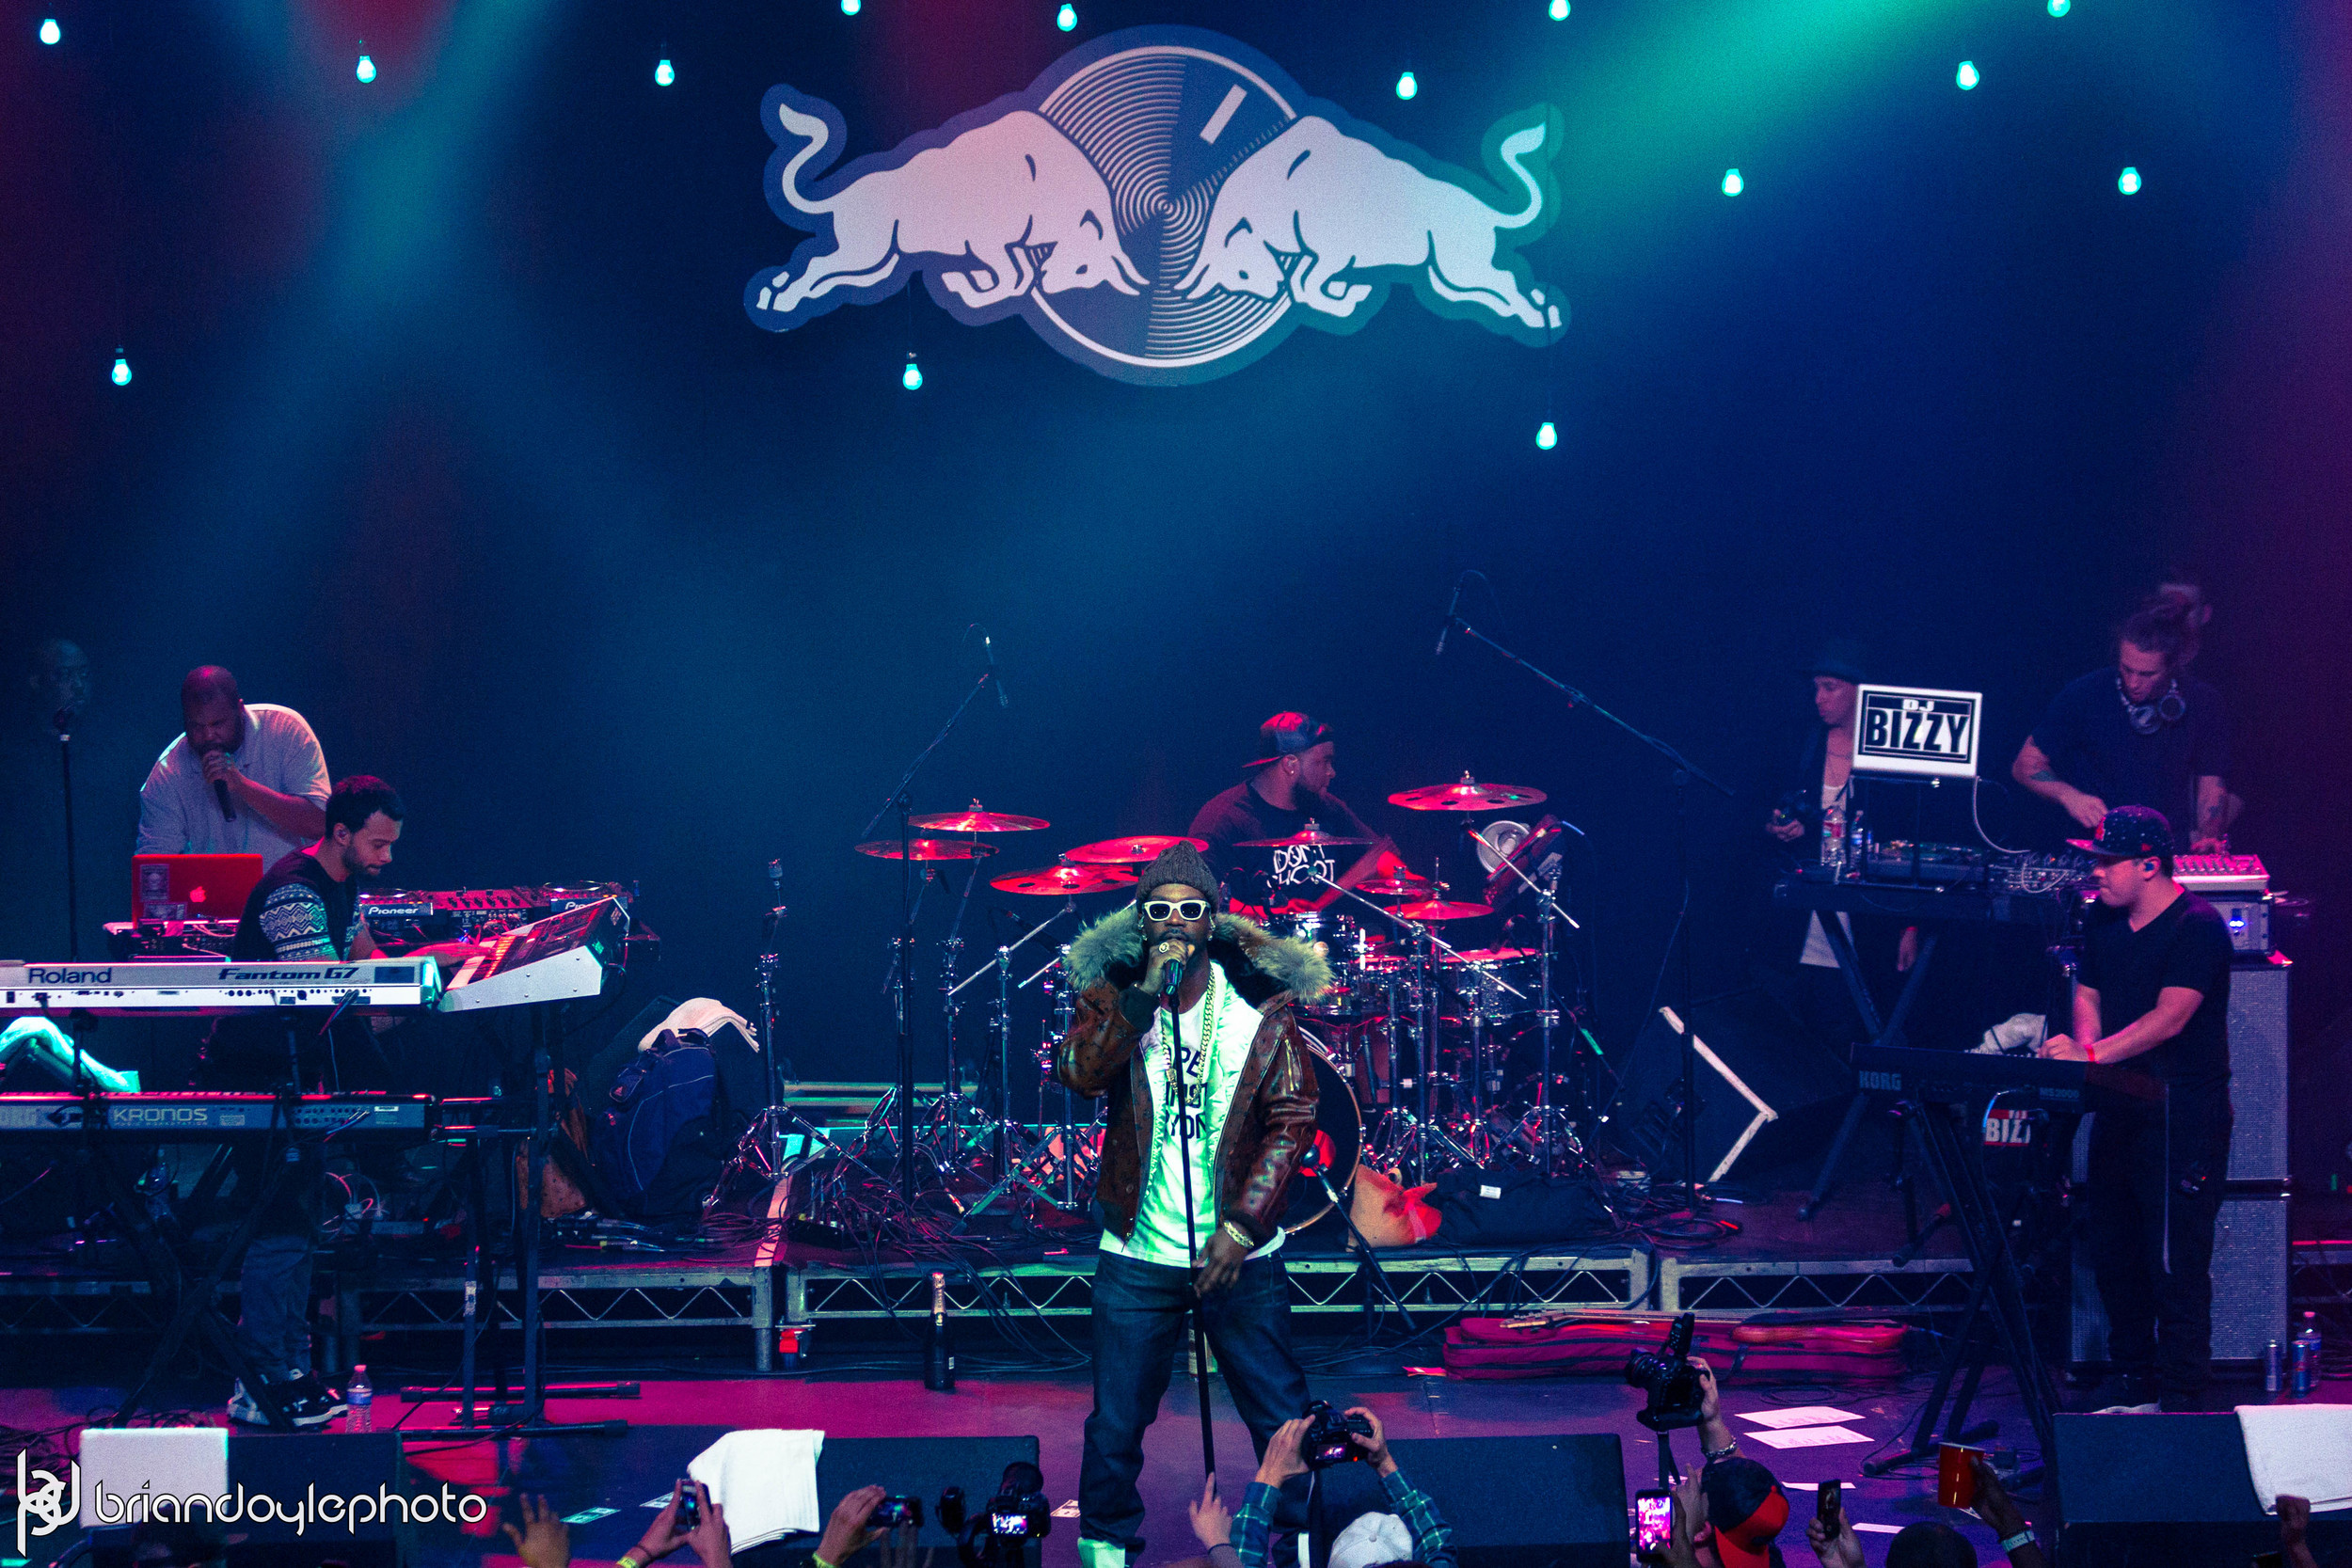 Lil Wayne, Juicy J, Two-9, Tree @ The Fonda 25.11.2014-33.jpg